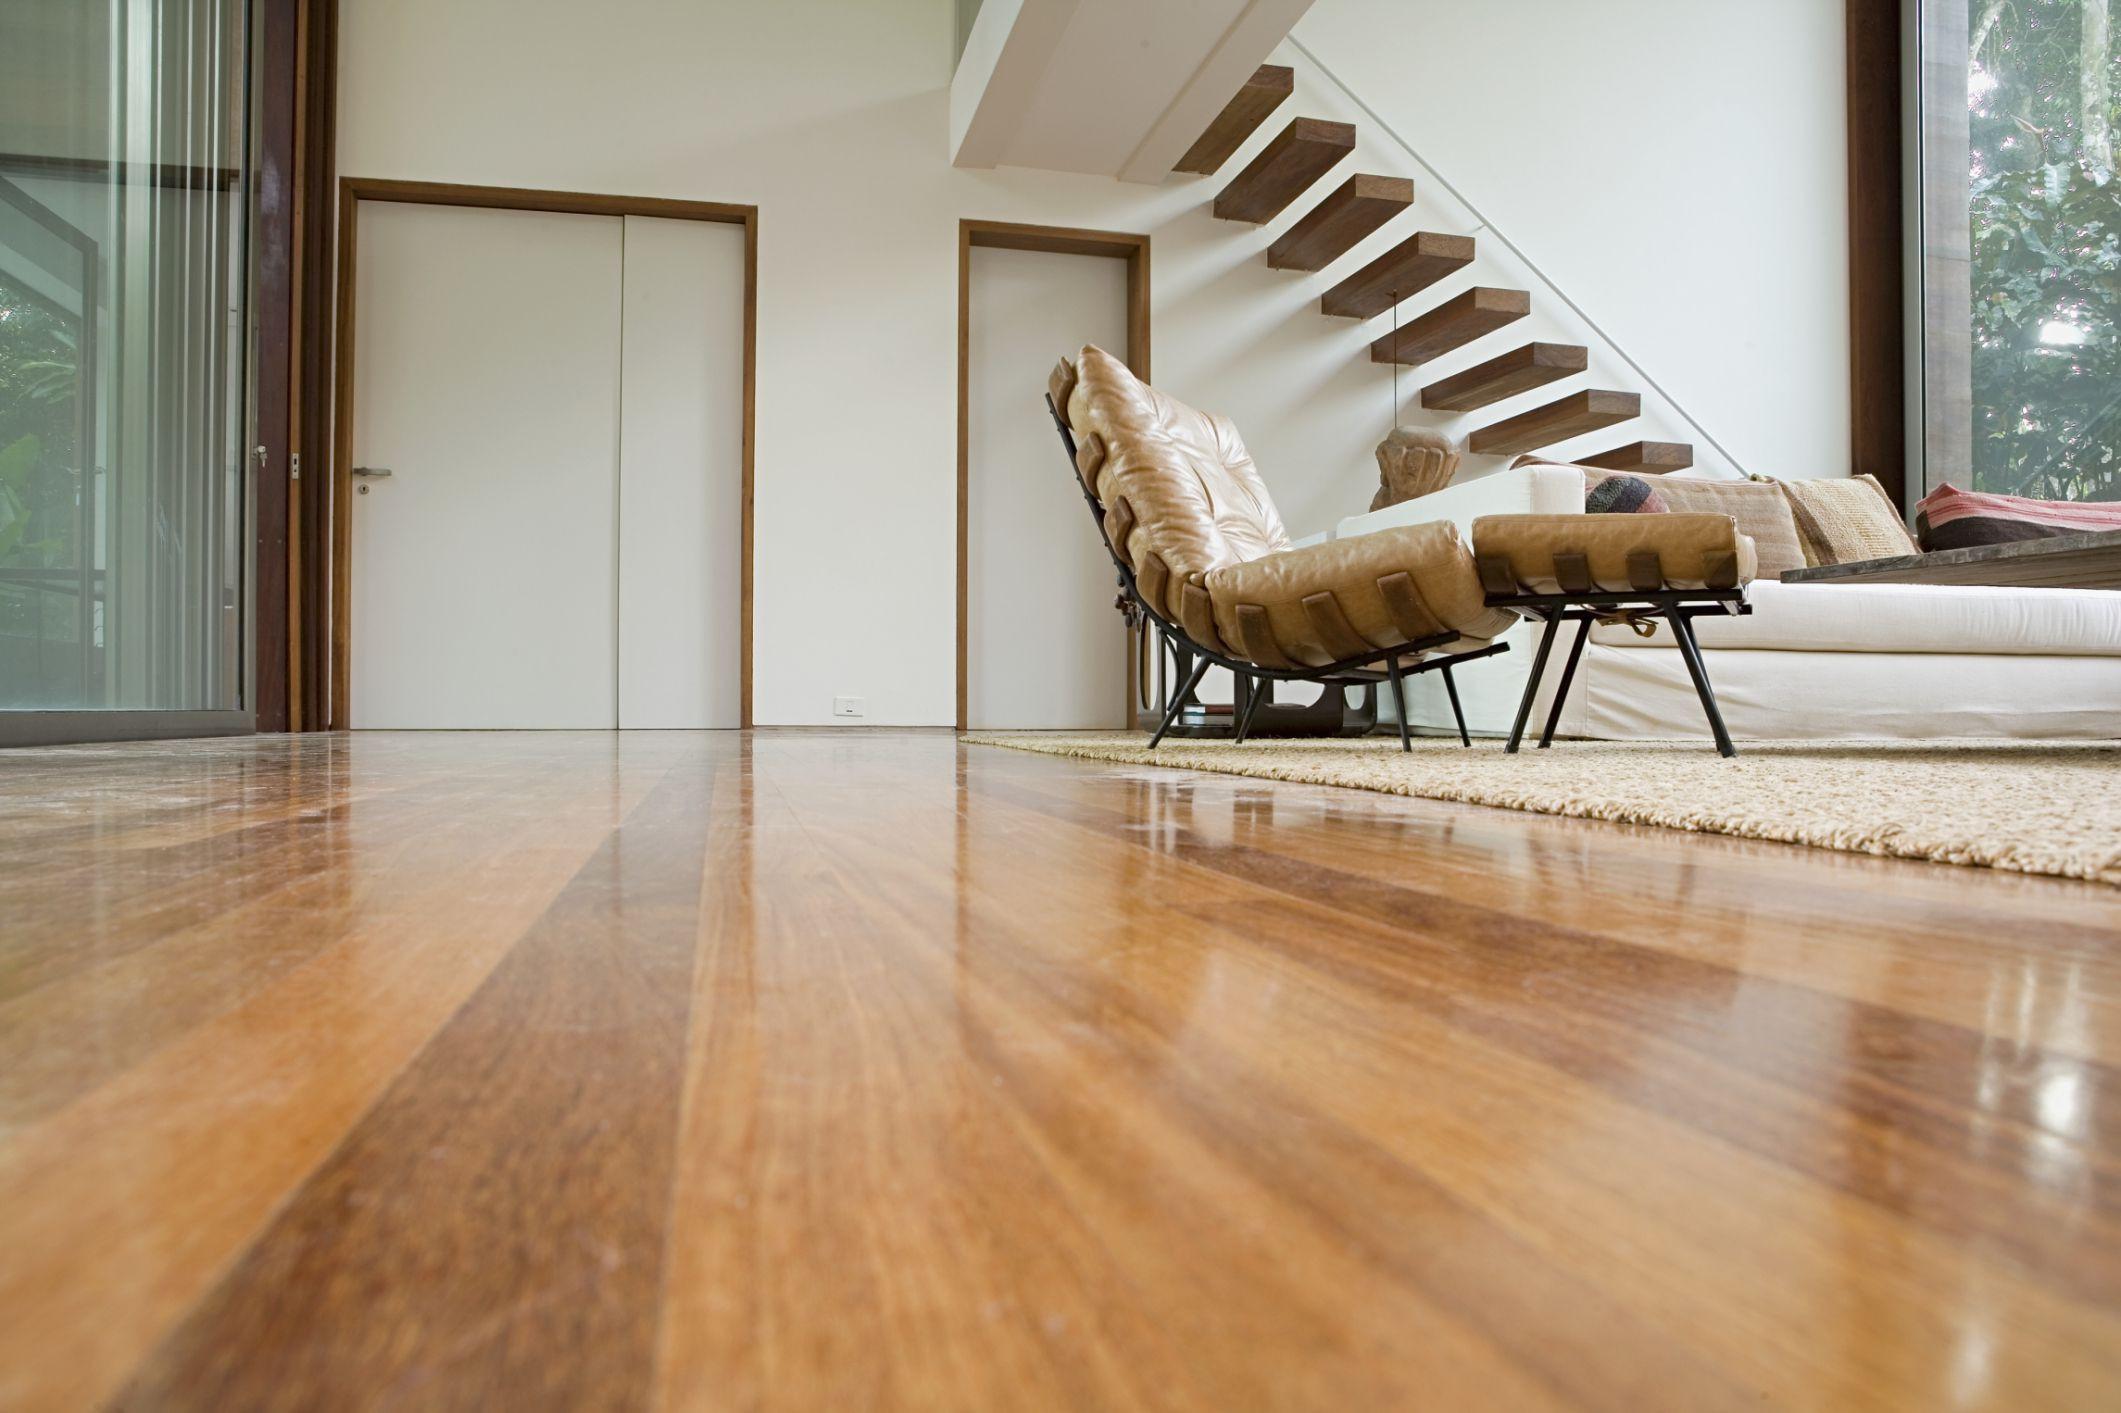 hardwood flooring installation reviews of engineered wood flooring vs solid wood flooring throughout 200571260 001 highres 56a49dec5f9b58b7d0d7dc1e